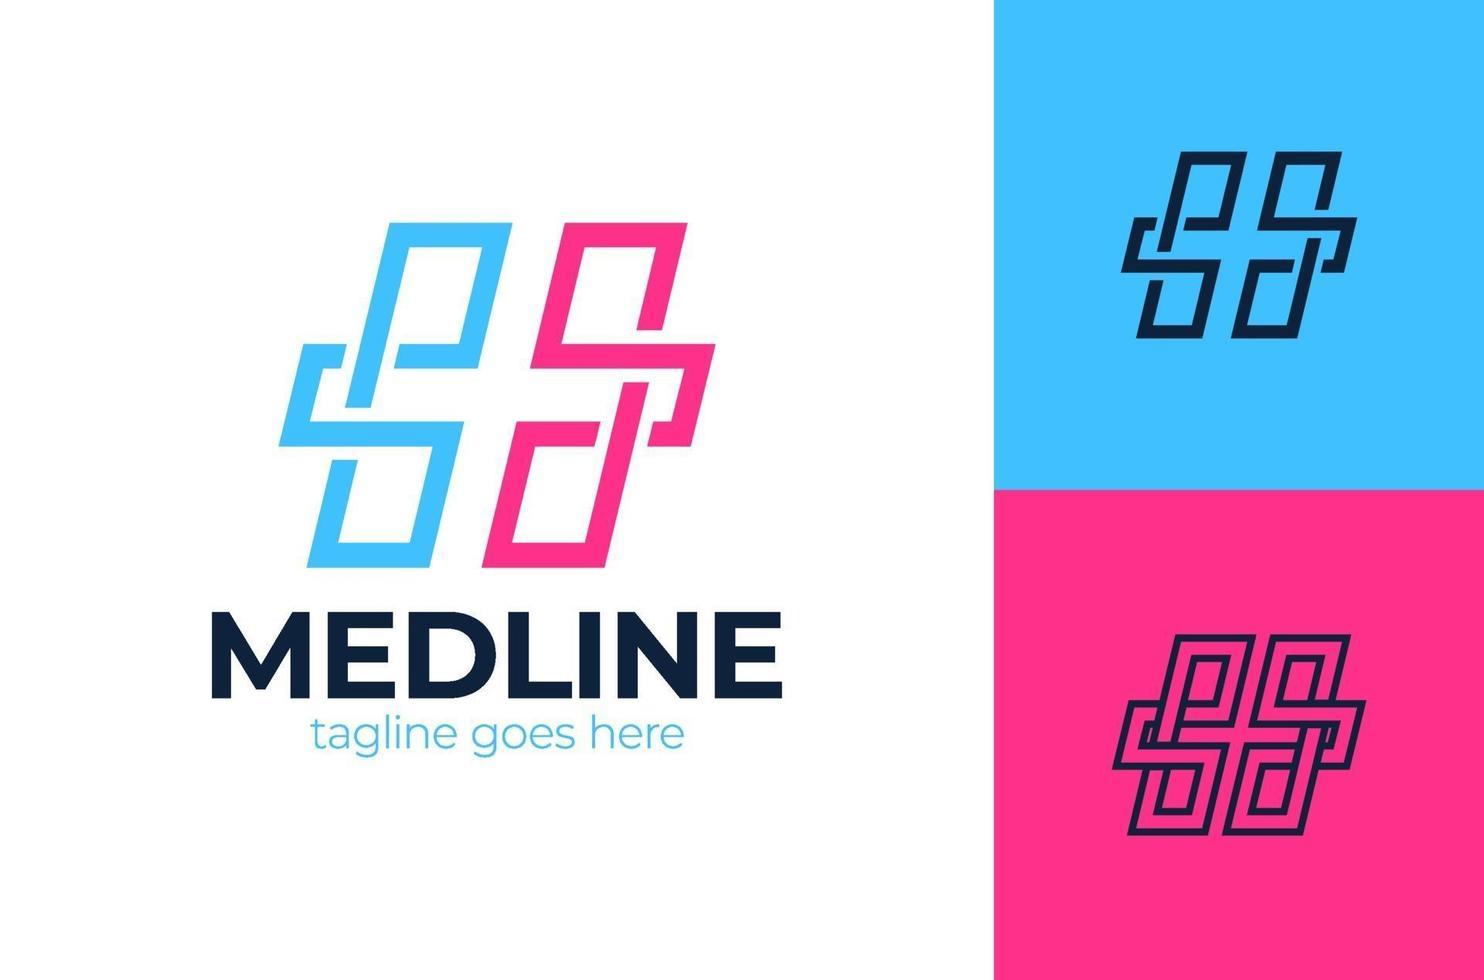 Creative Health Care Concept Logo Design Template. Cross plus medical logo icon design template elements vector